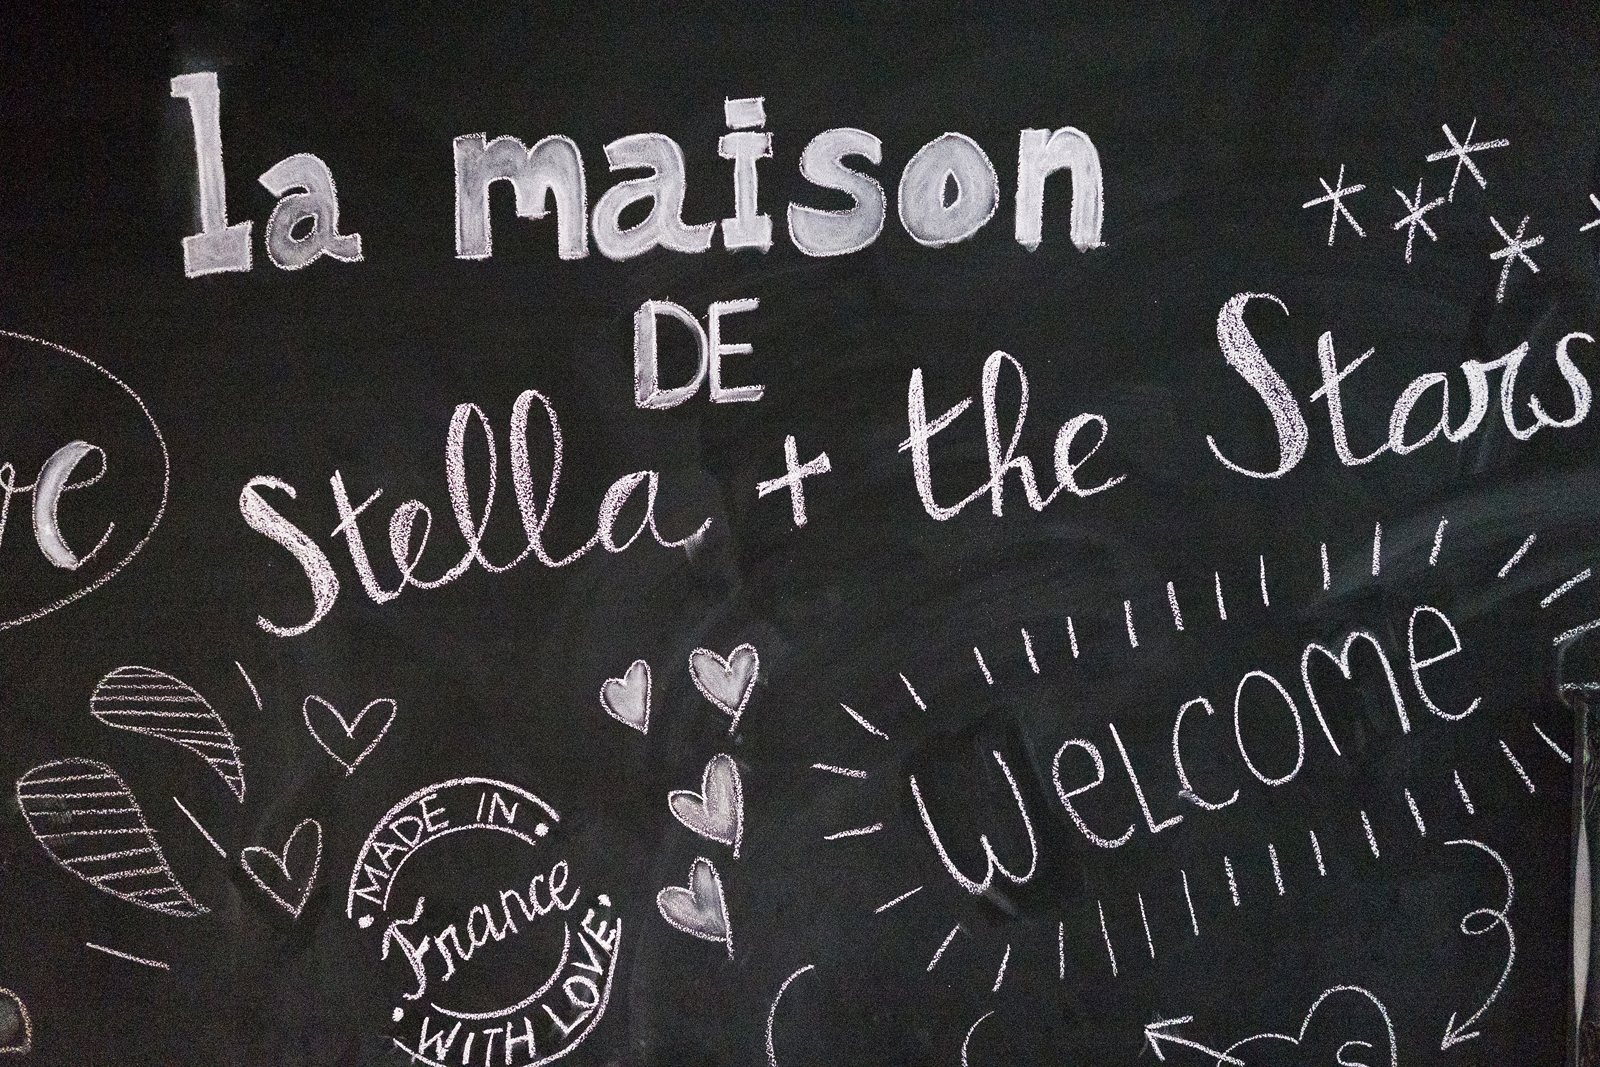 The welcoming blackboard in the hallway